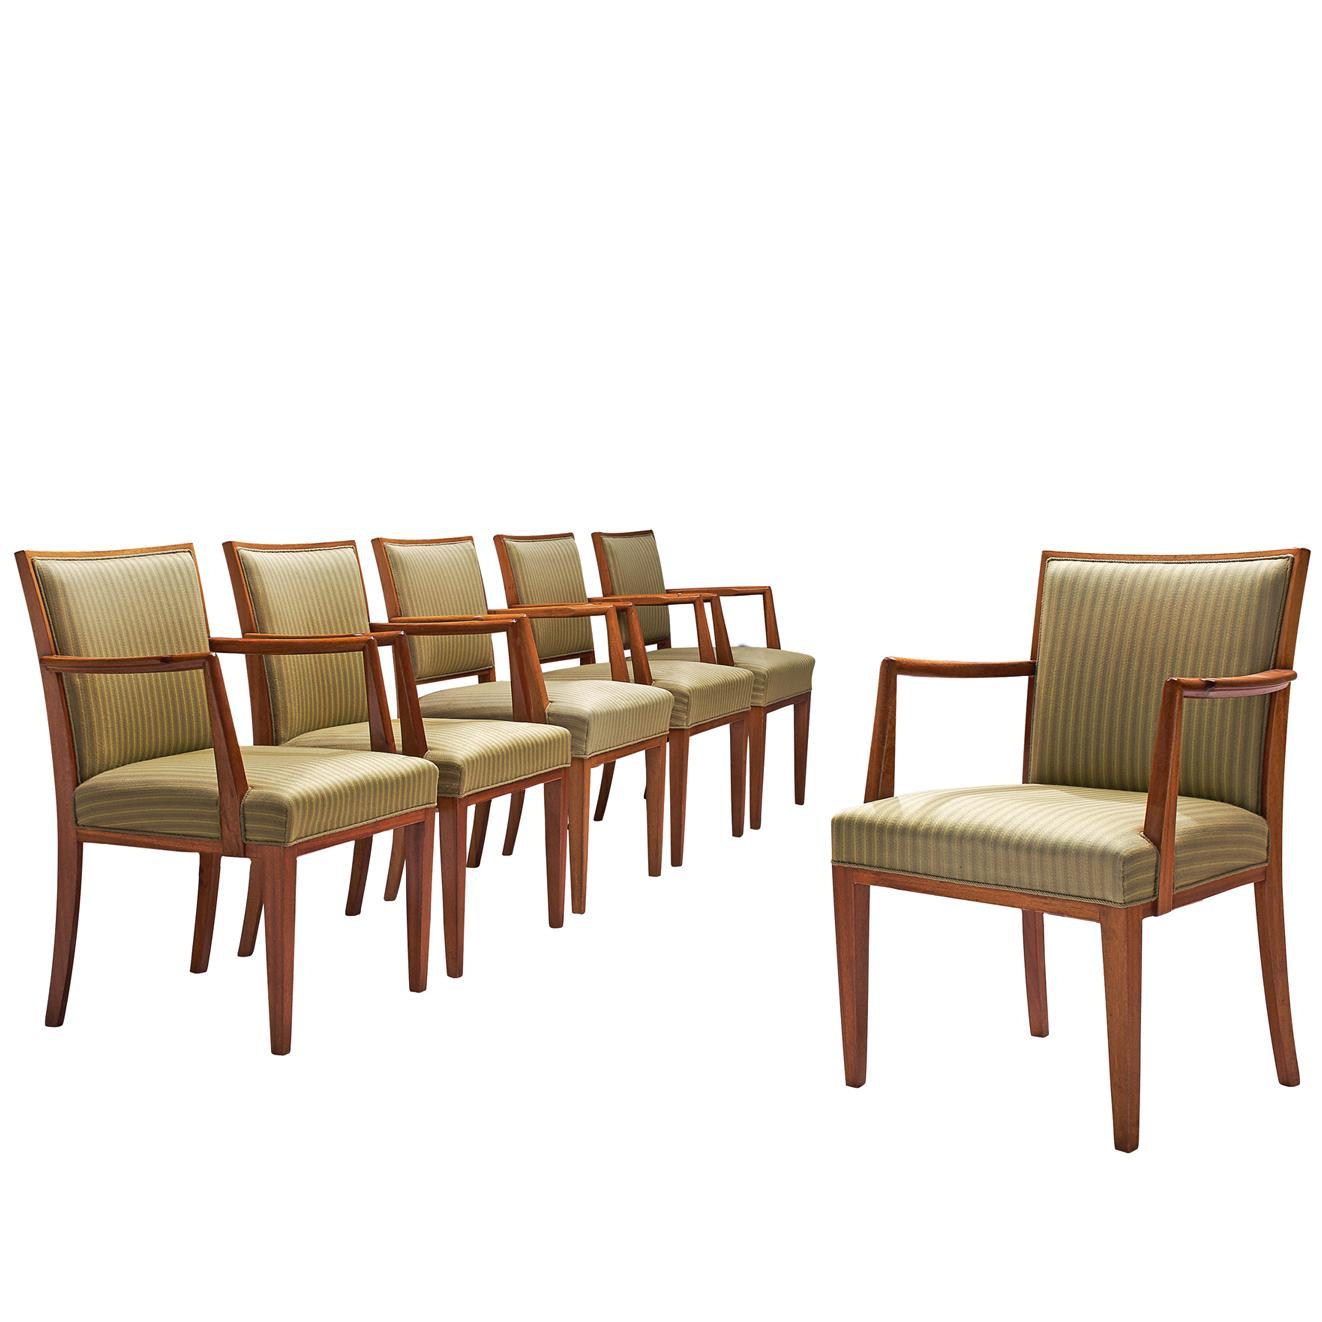 Swedish Set of Six Armchairs in Teak, 1940s